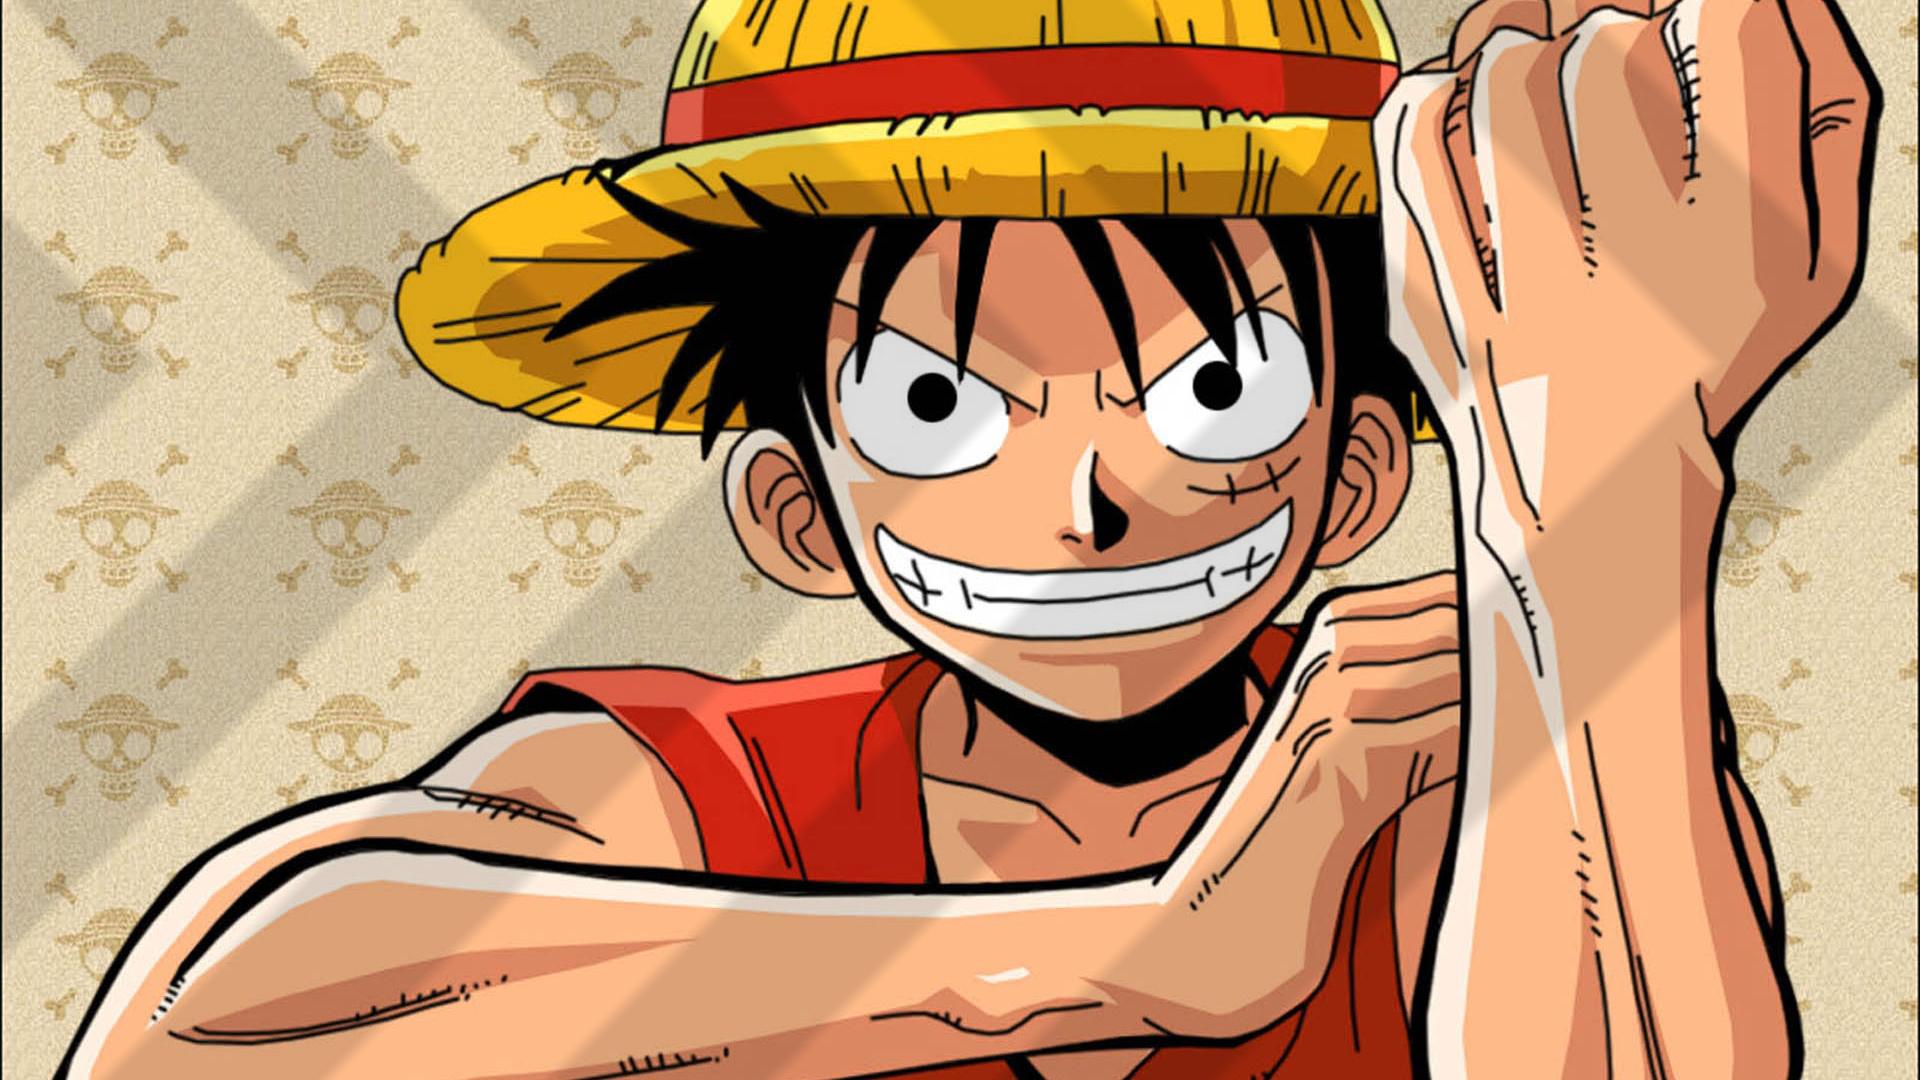 Download One Piece Luffy HD Wallpaper HD Wallpaper 1920x1080